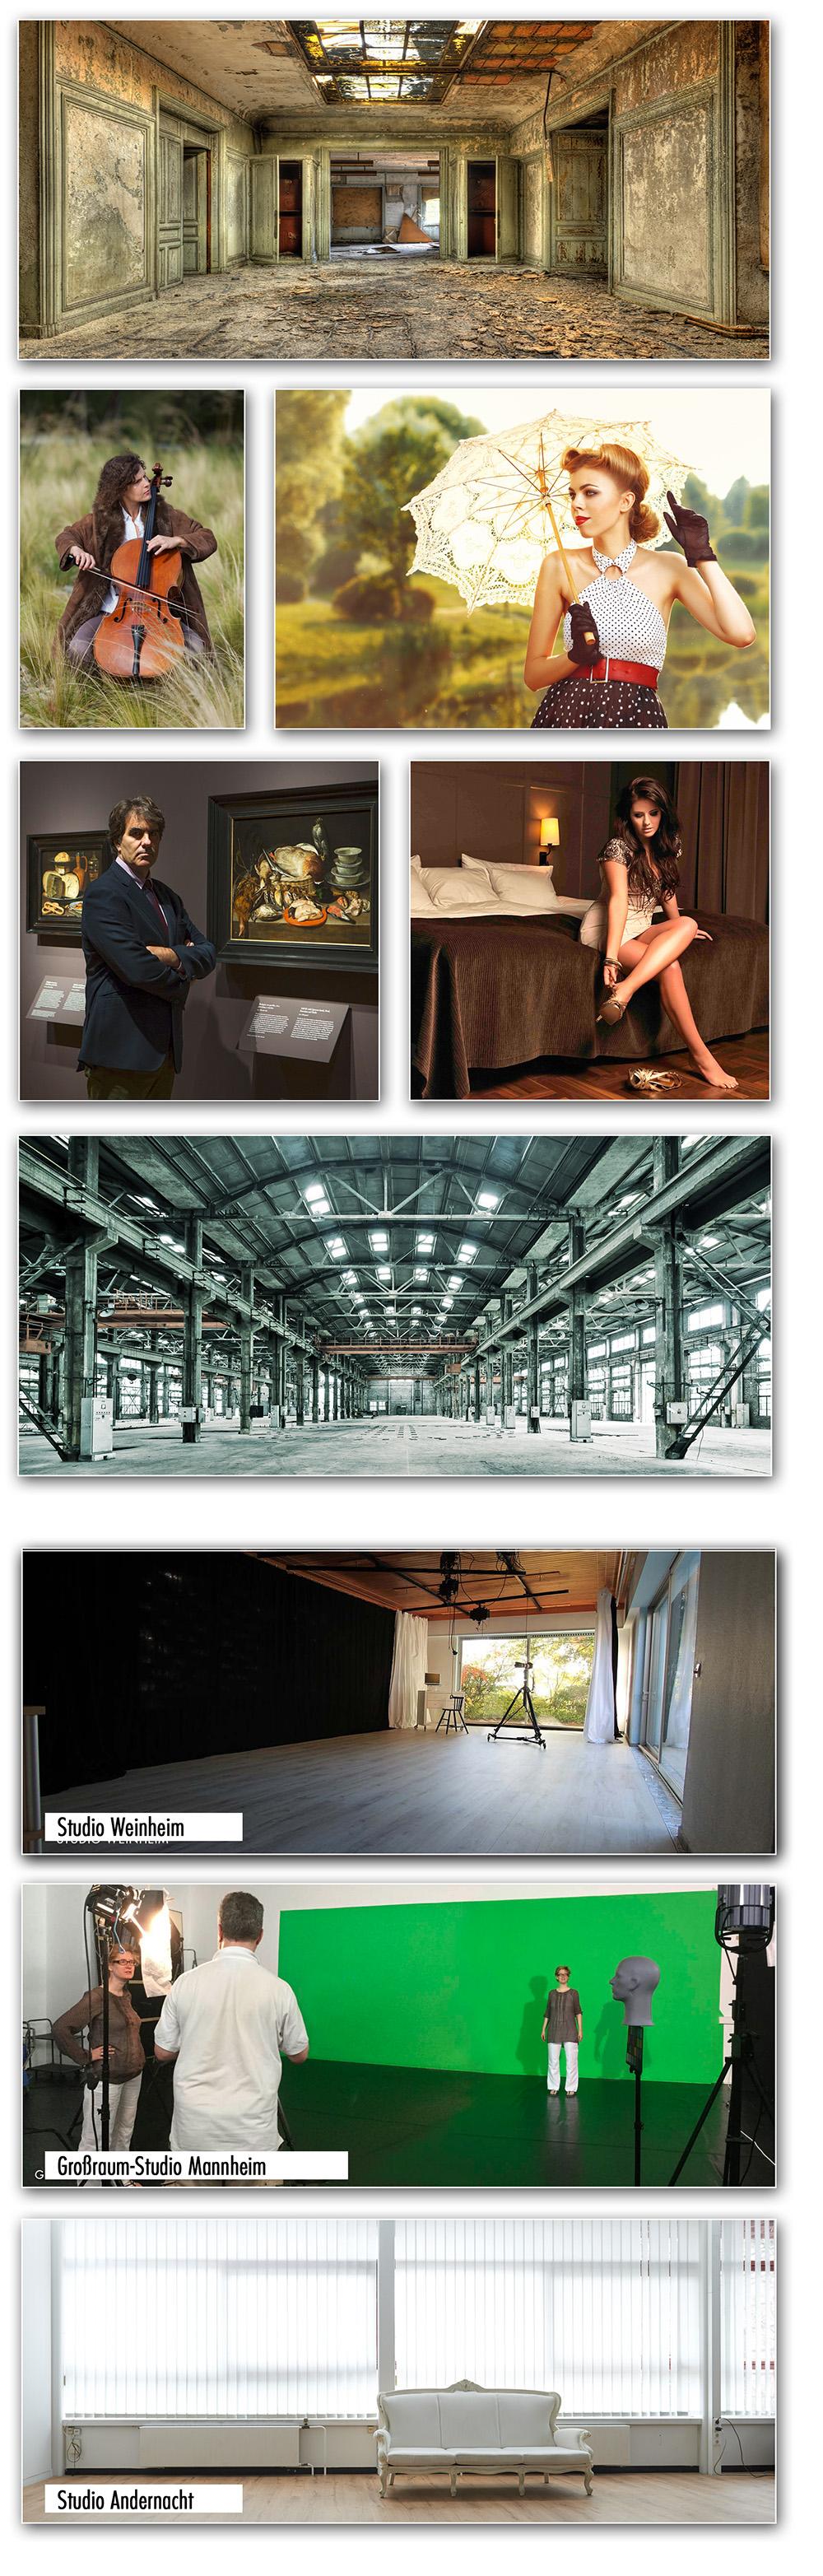 Alternative Studios @ BlickFang2 Fotostudio, Filmstudio in Weinheim und Andernach, Fotograf